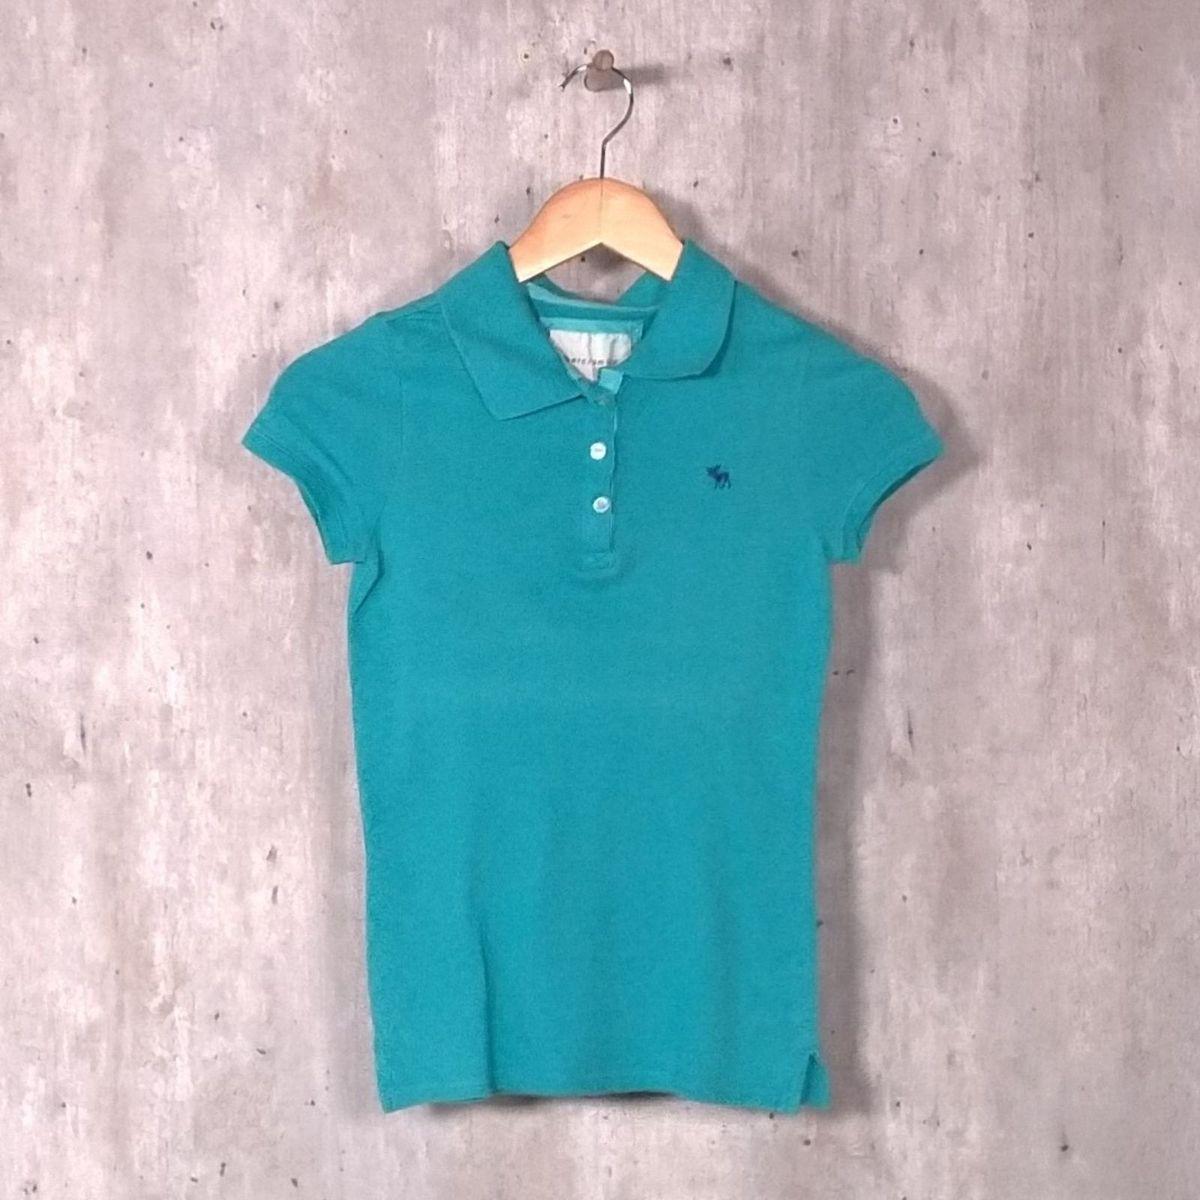 9f264cb9b7 camisa polo azul turquesa - camisas abercrombie   fitch